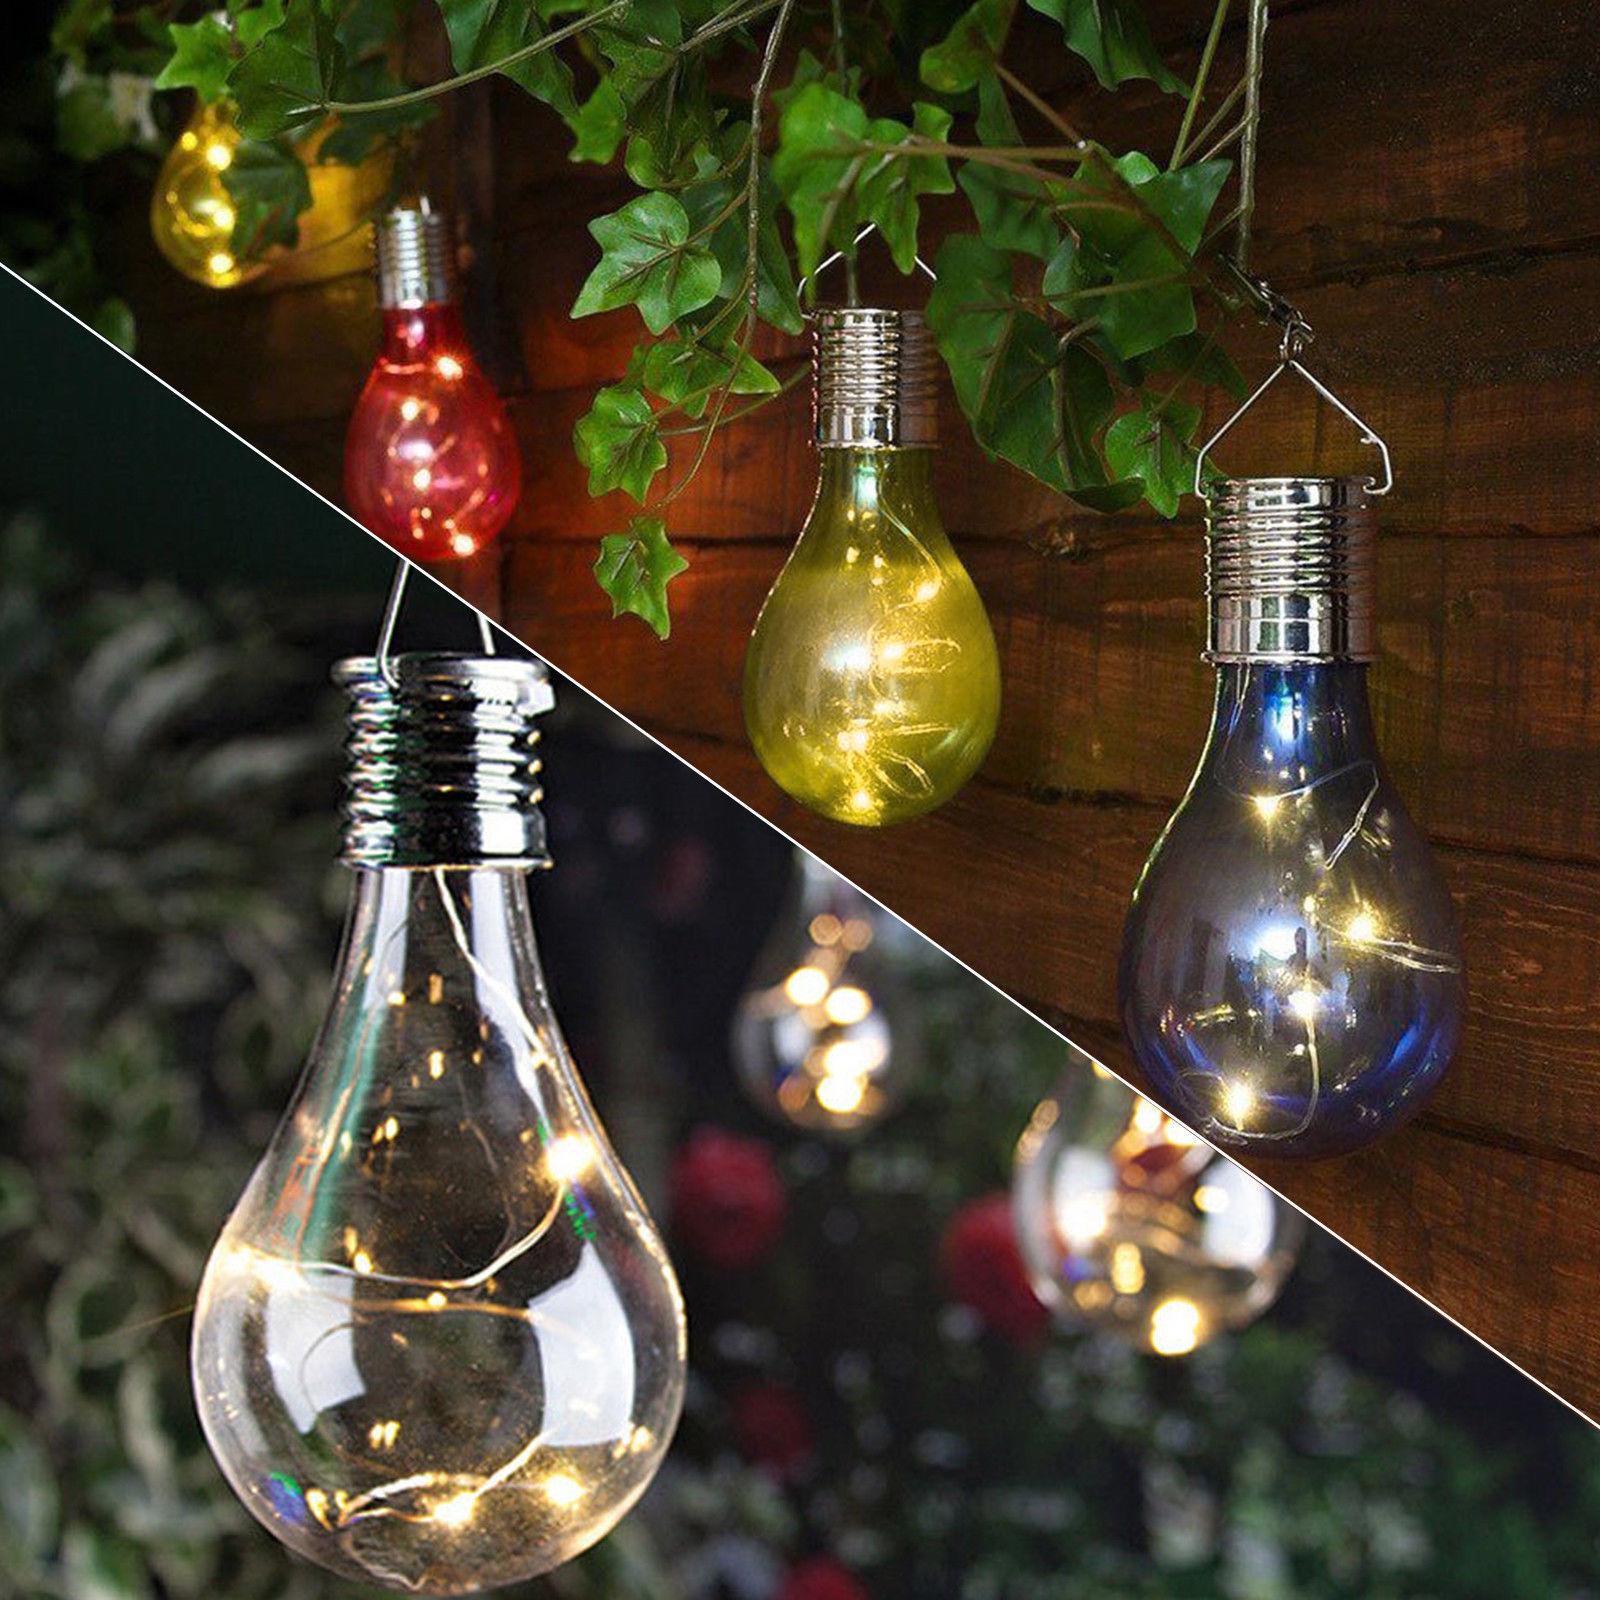 LED Solar Powered Bulb Light Outdoor Garden Hanging Decor Lamp ...